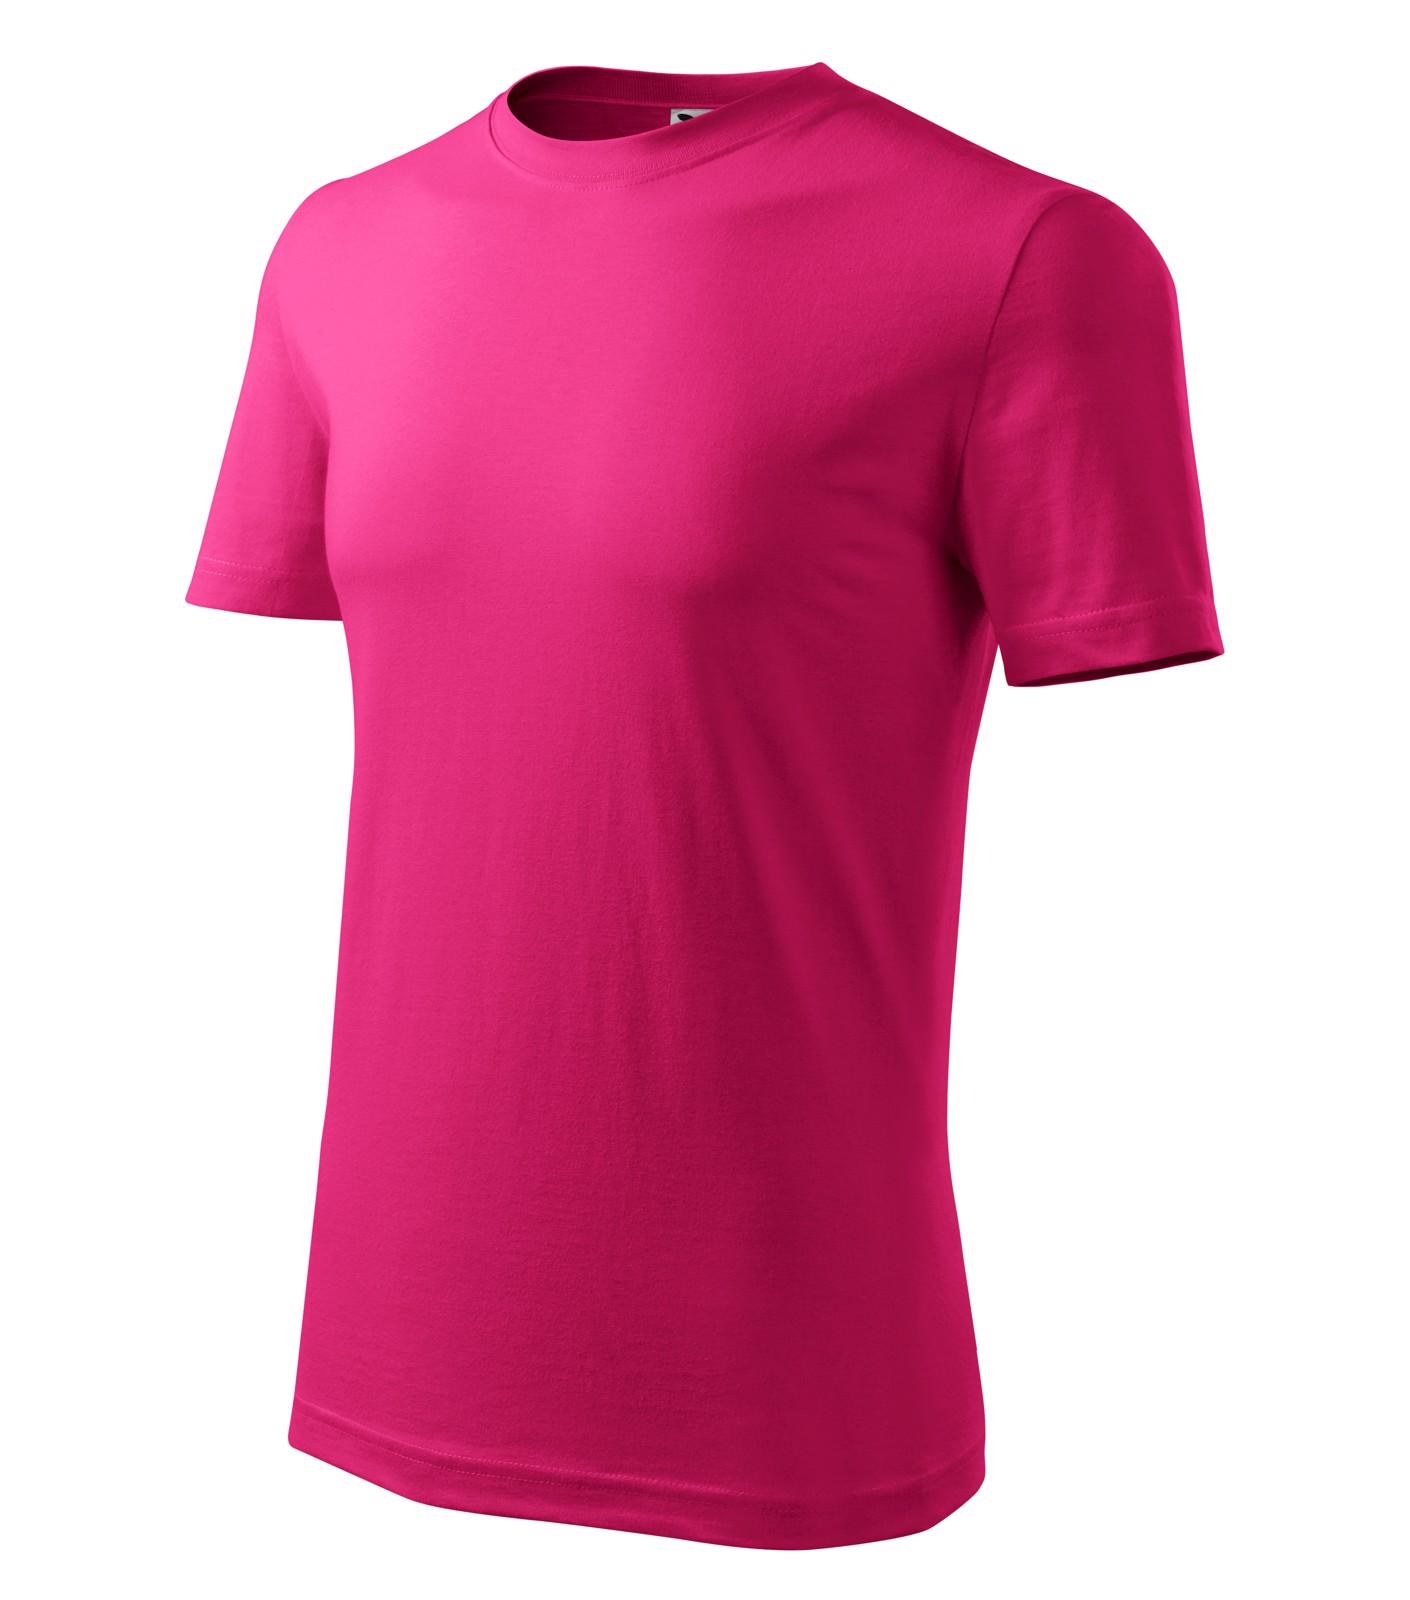 T-shirt men's Malfini Classic New - Magenta / M